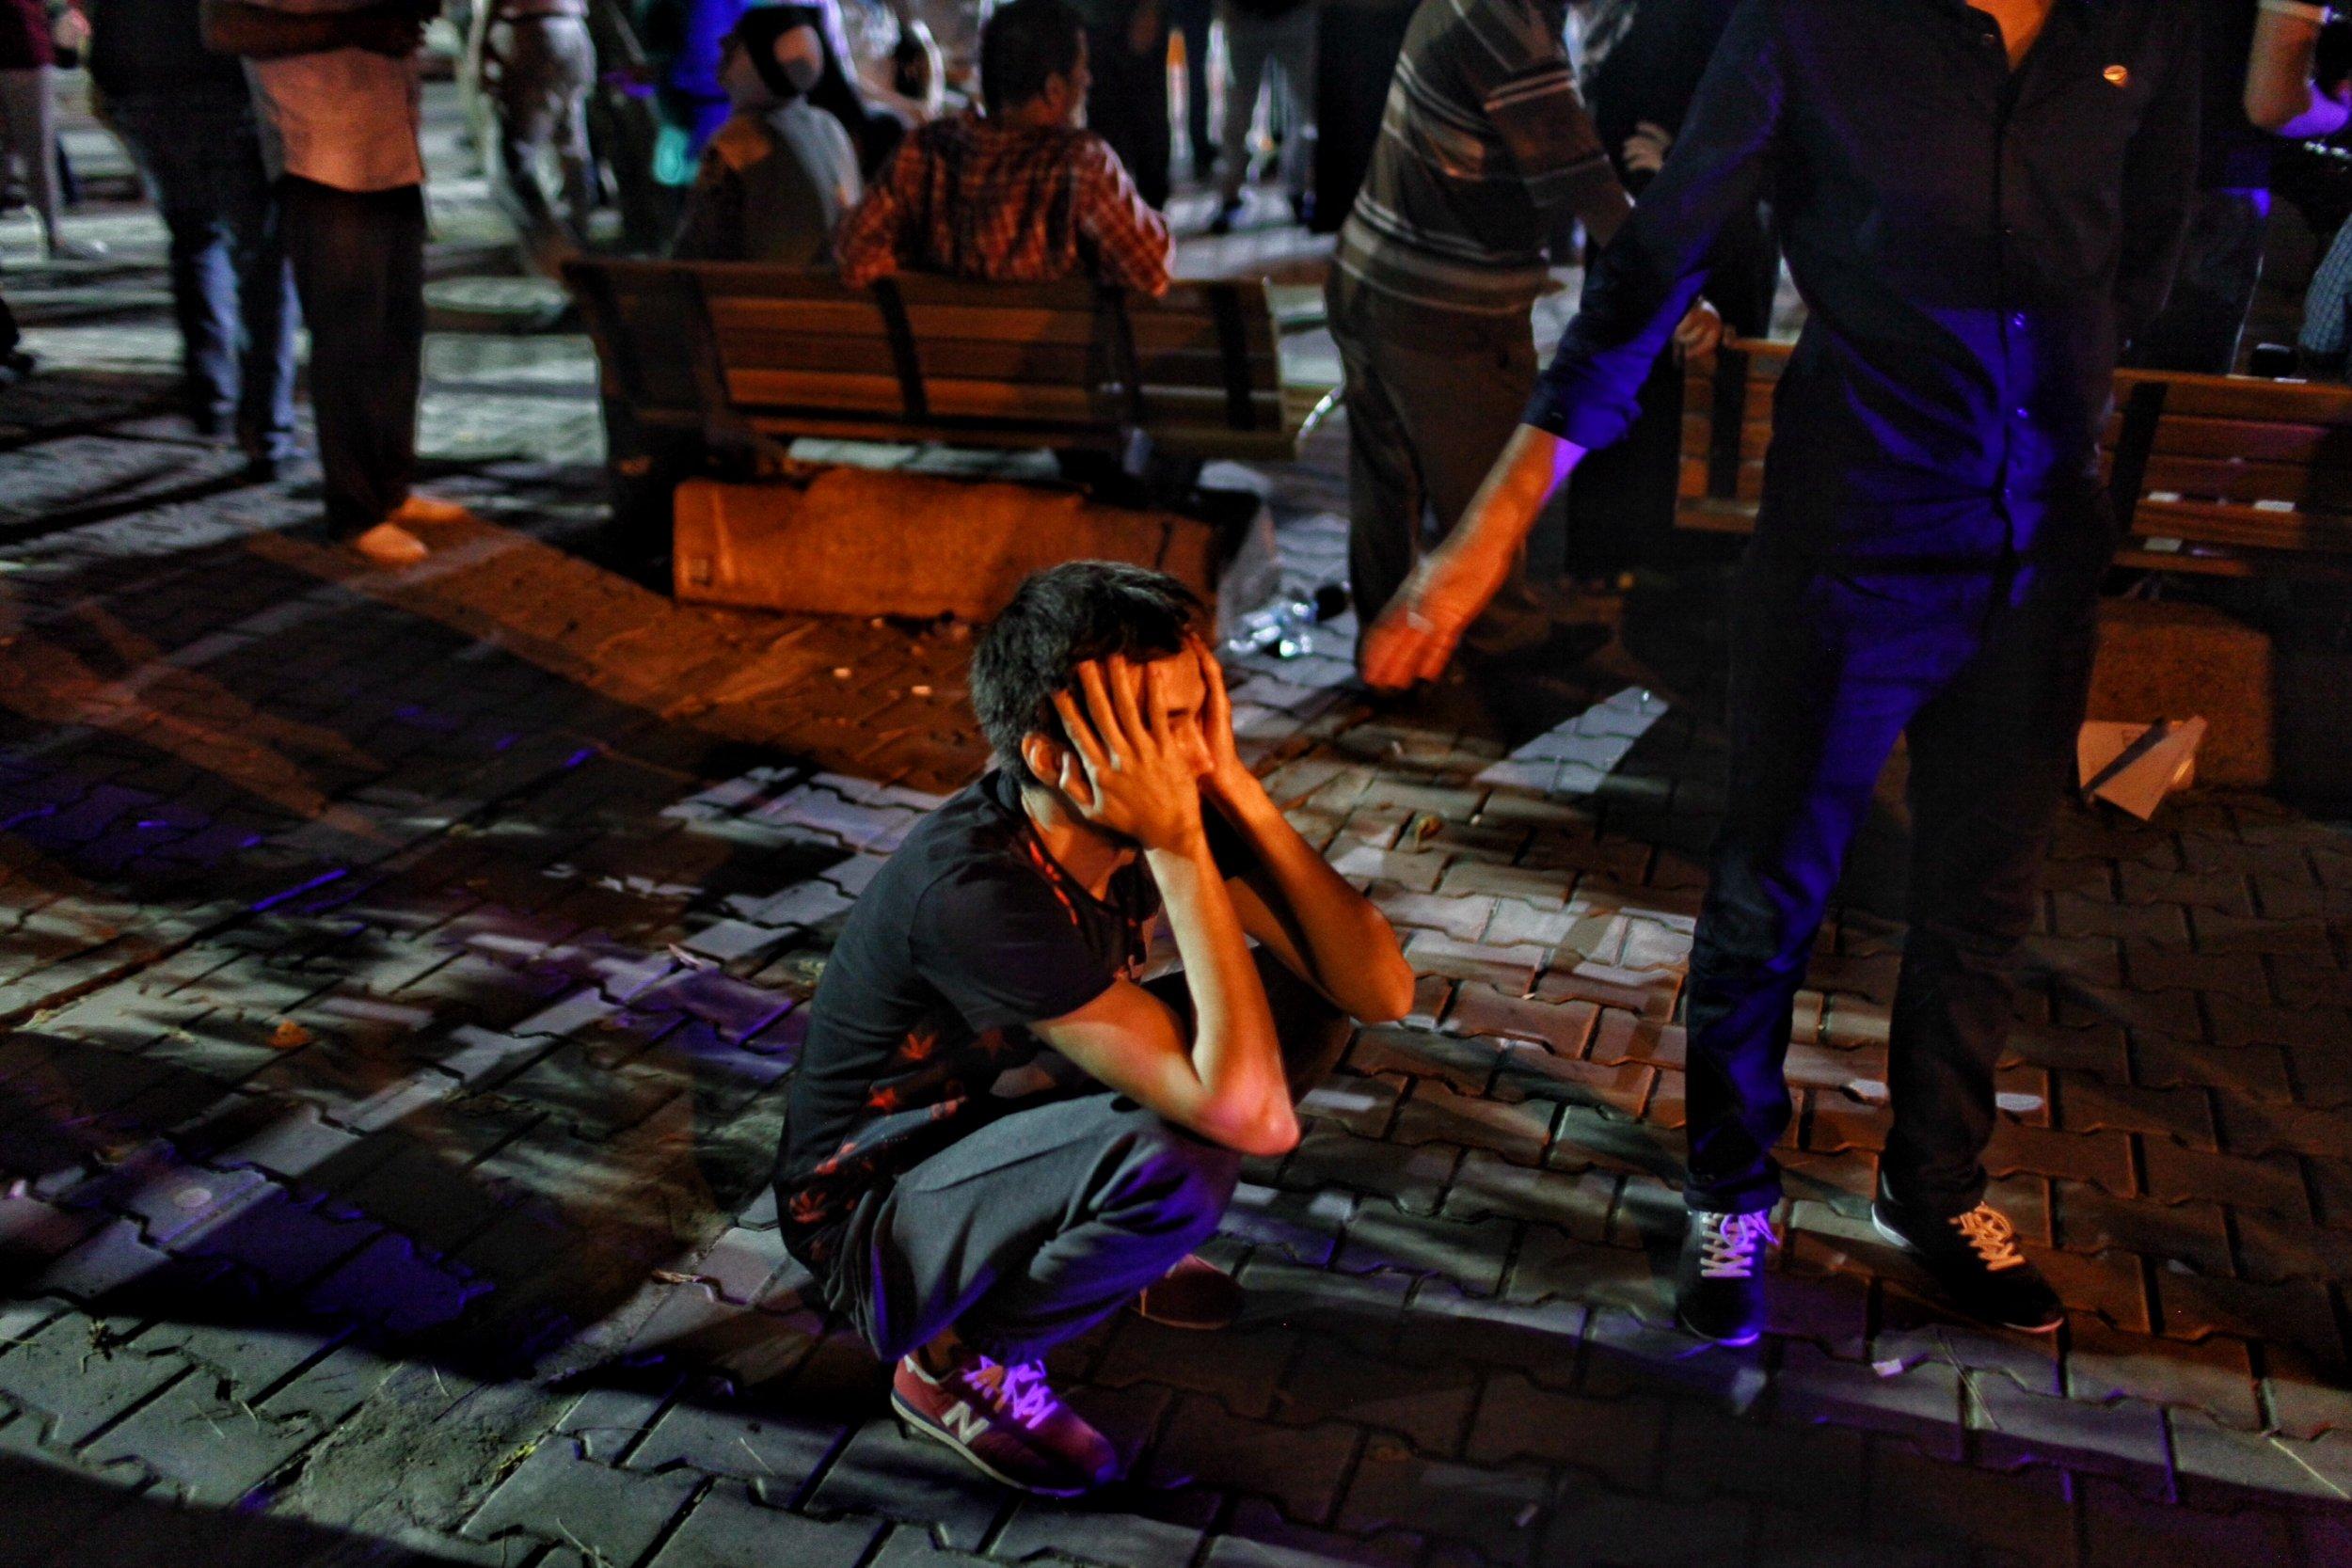 Istanbul Airport Attack Victim's Relative